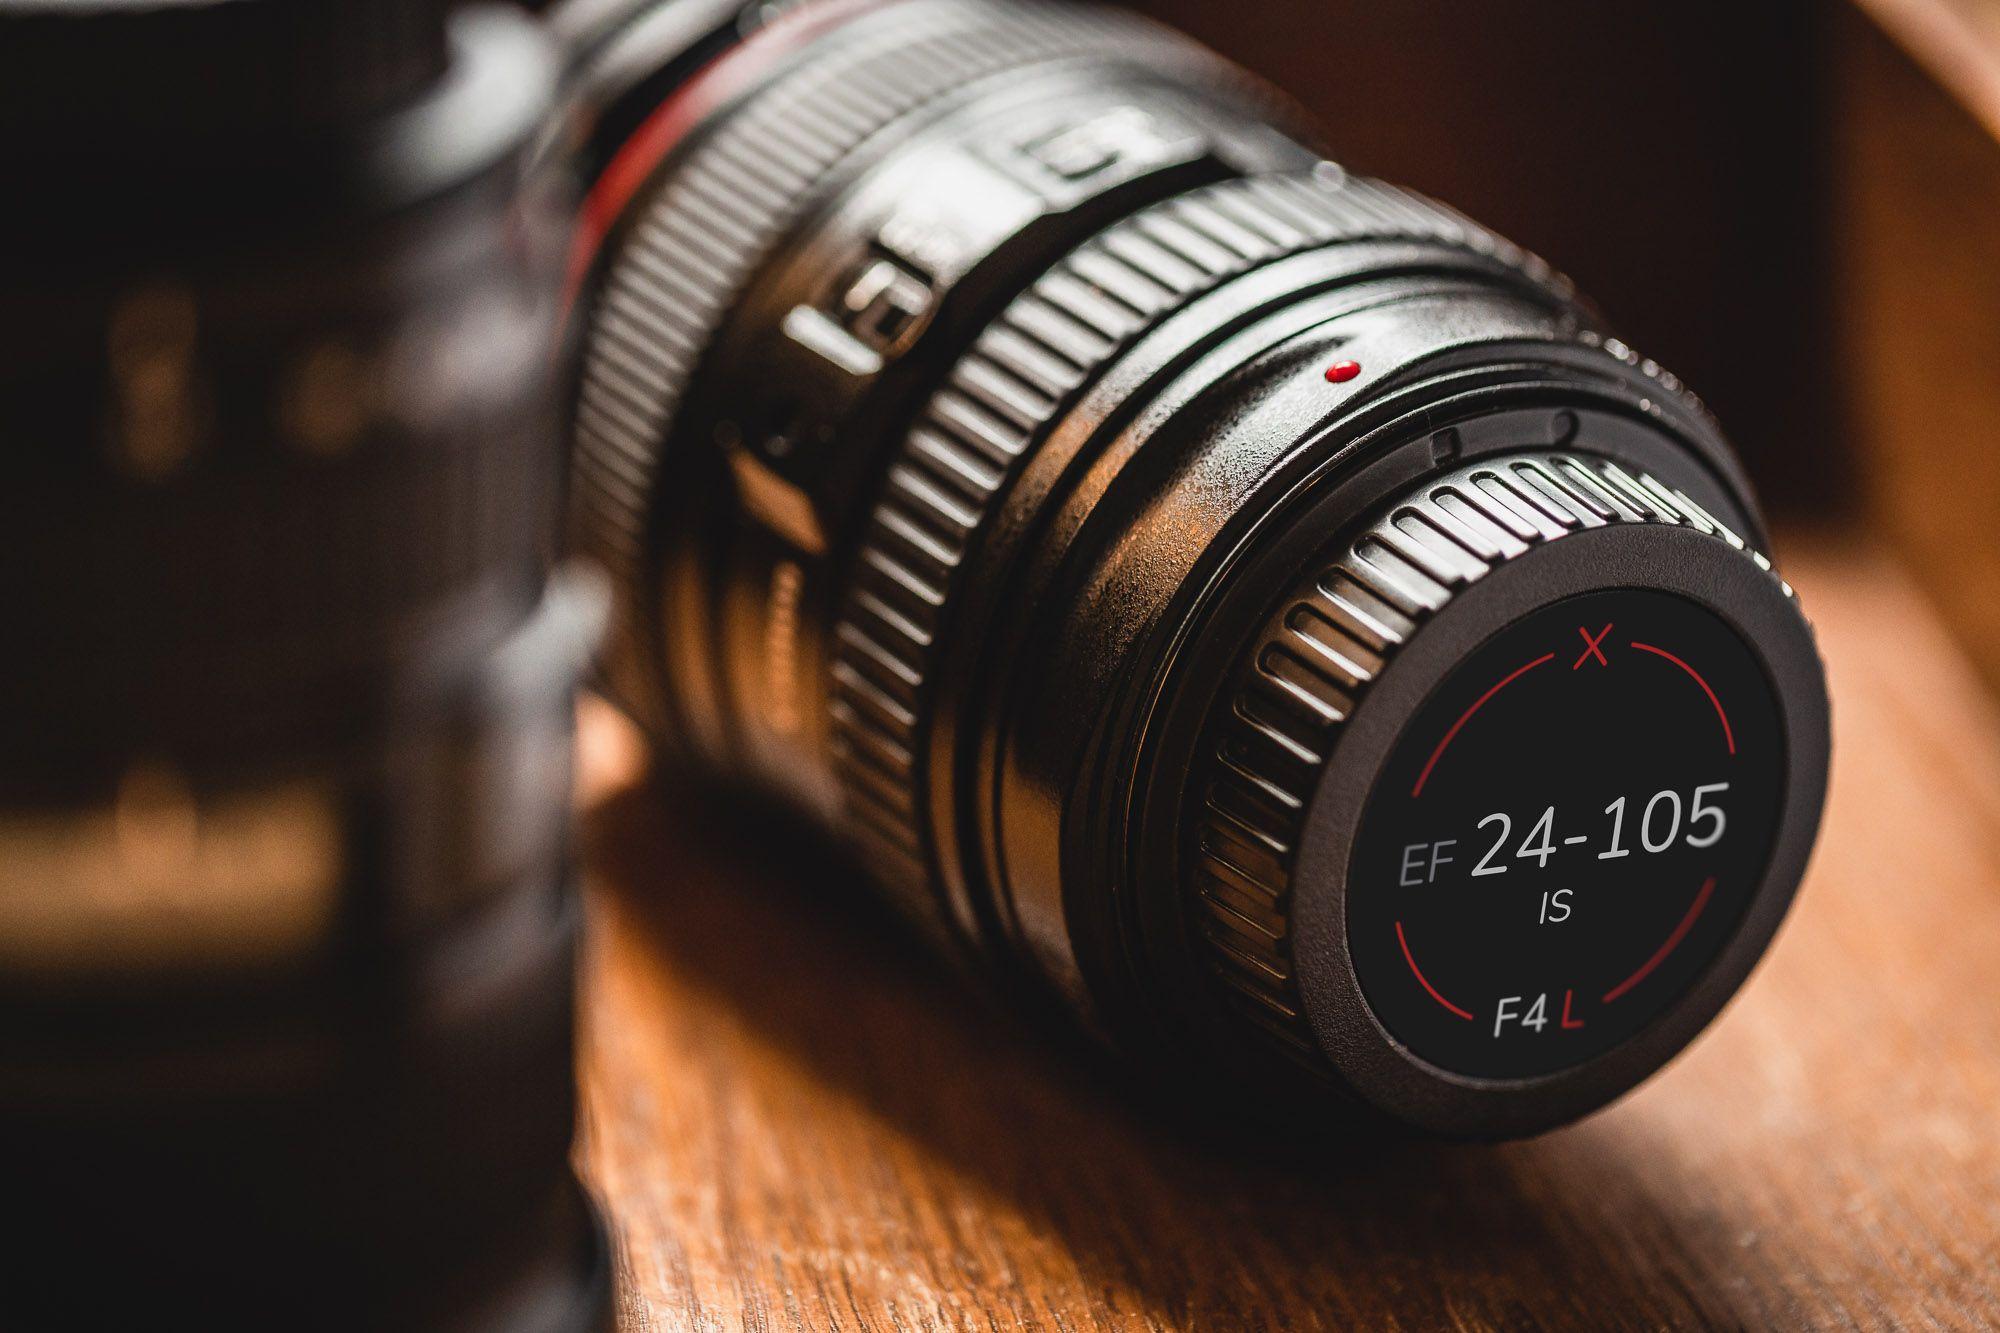 Field Made Canon Ef Lens Cap Identification Stickers Testimonial Canon Ef Lenses Lens Canon Ef